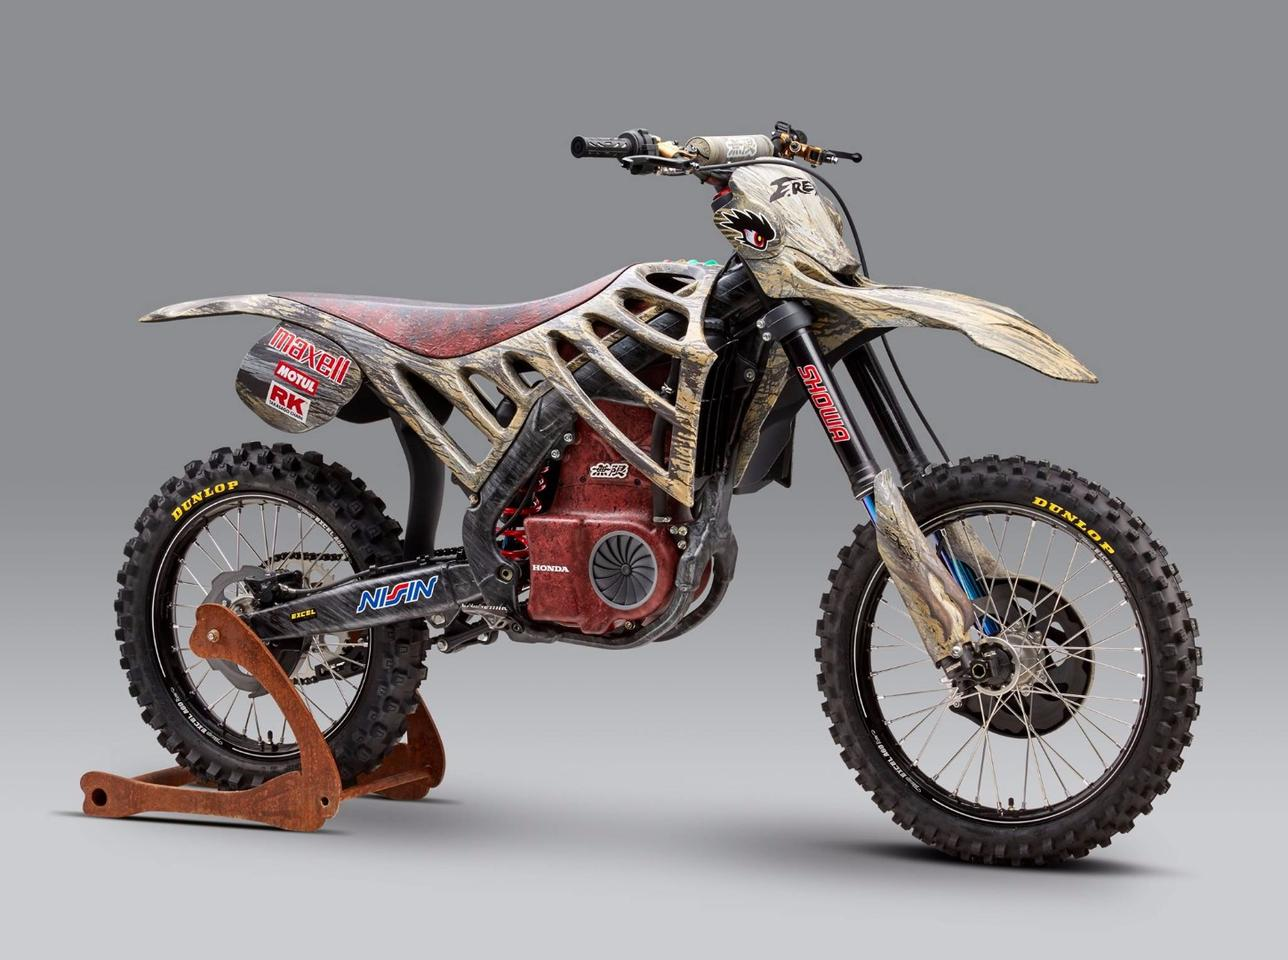 The E.Rex is a concept motocross racer by Mugen and Honda